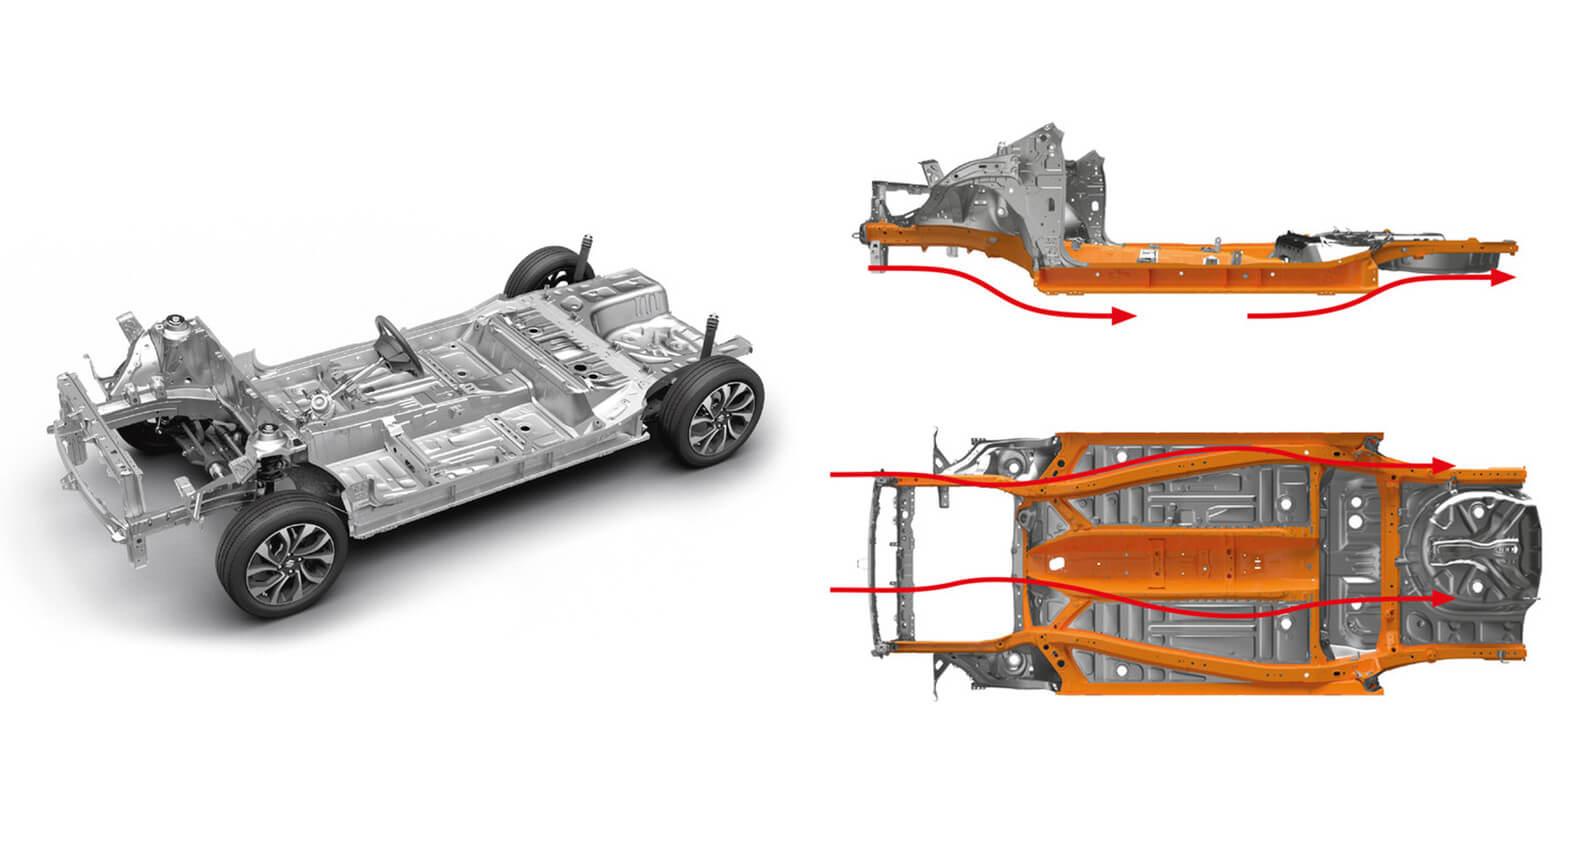 Enhanced vehicle performance